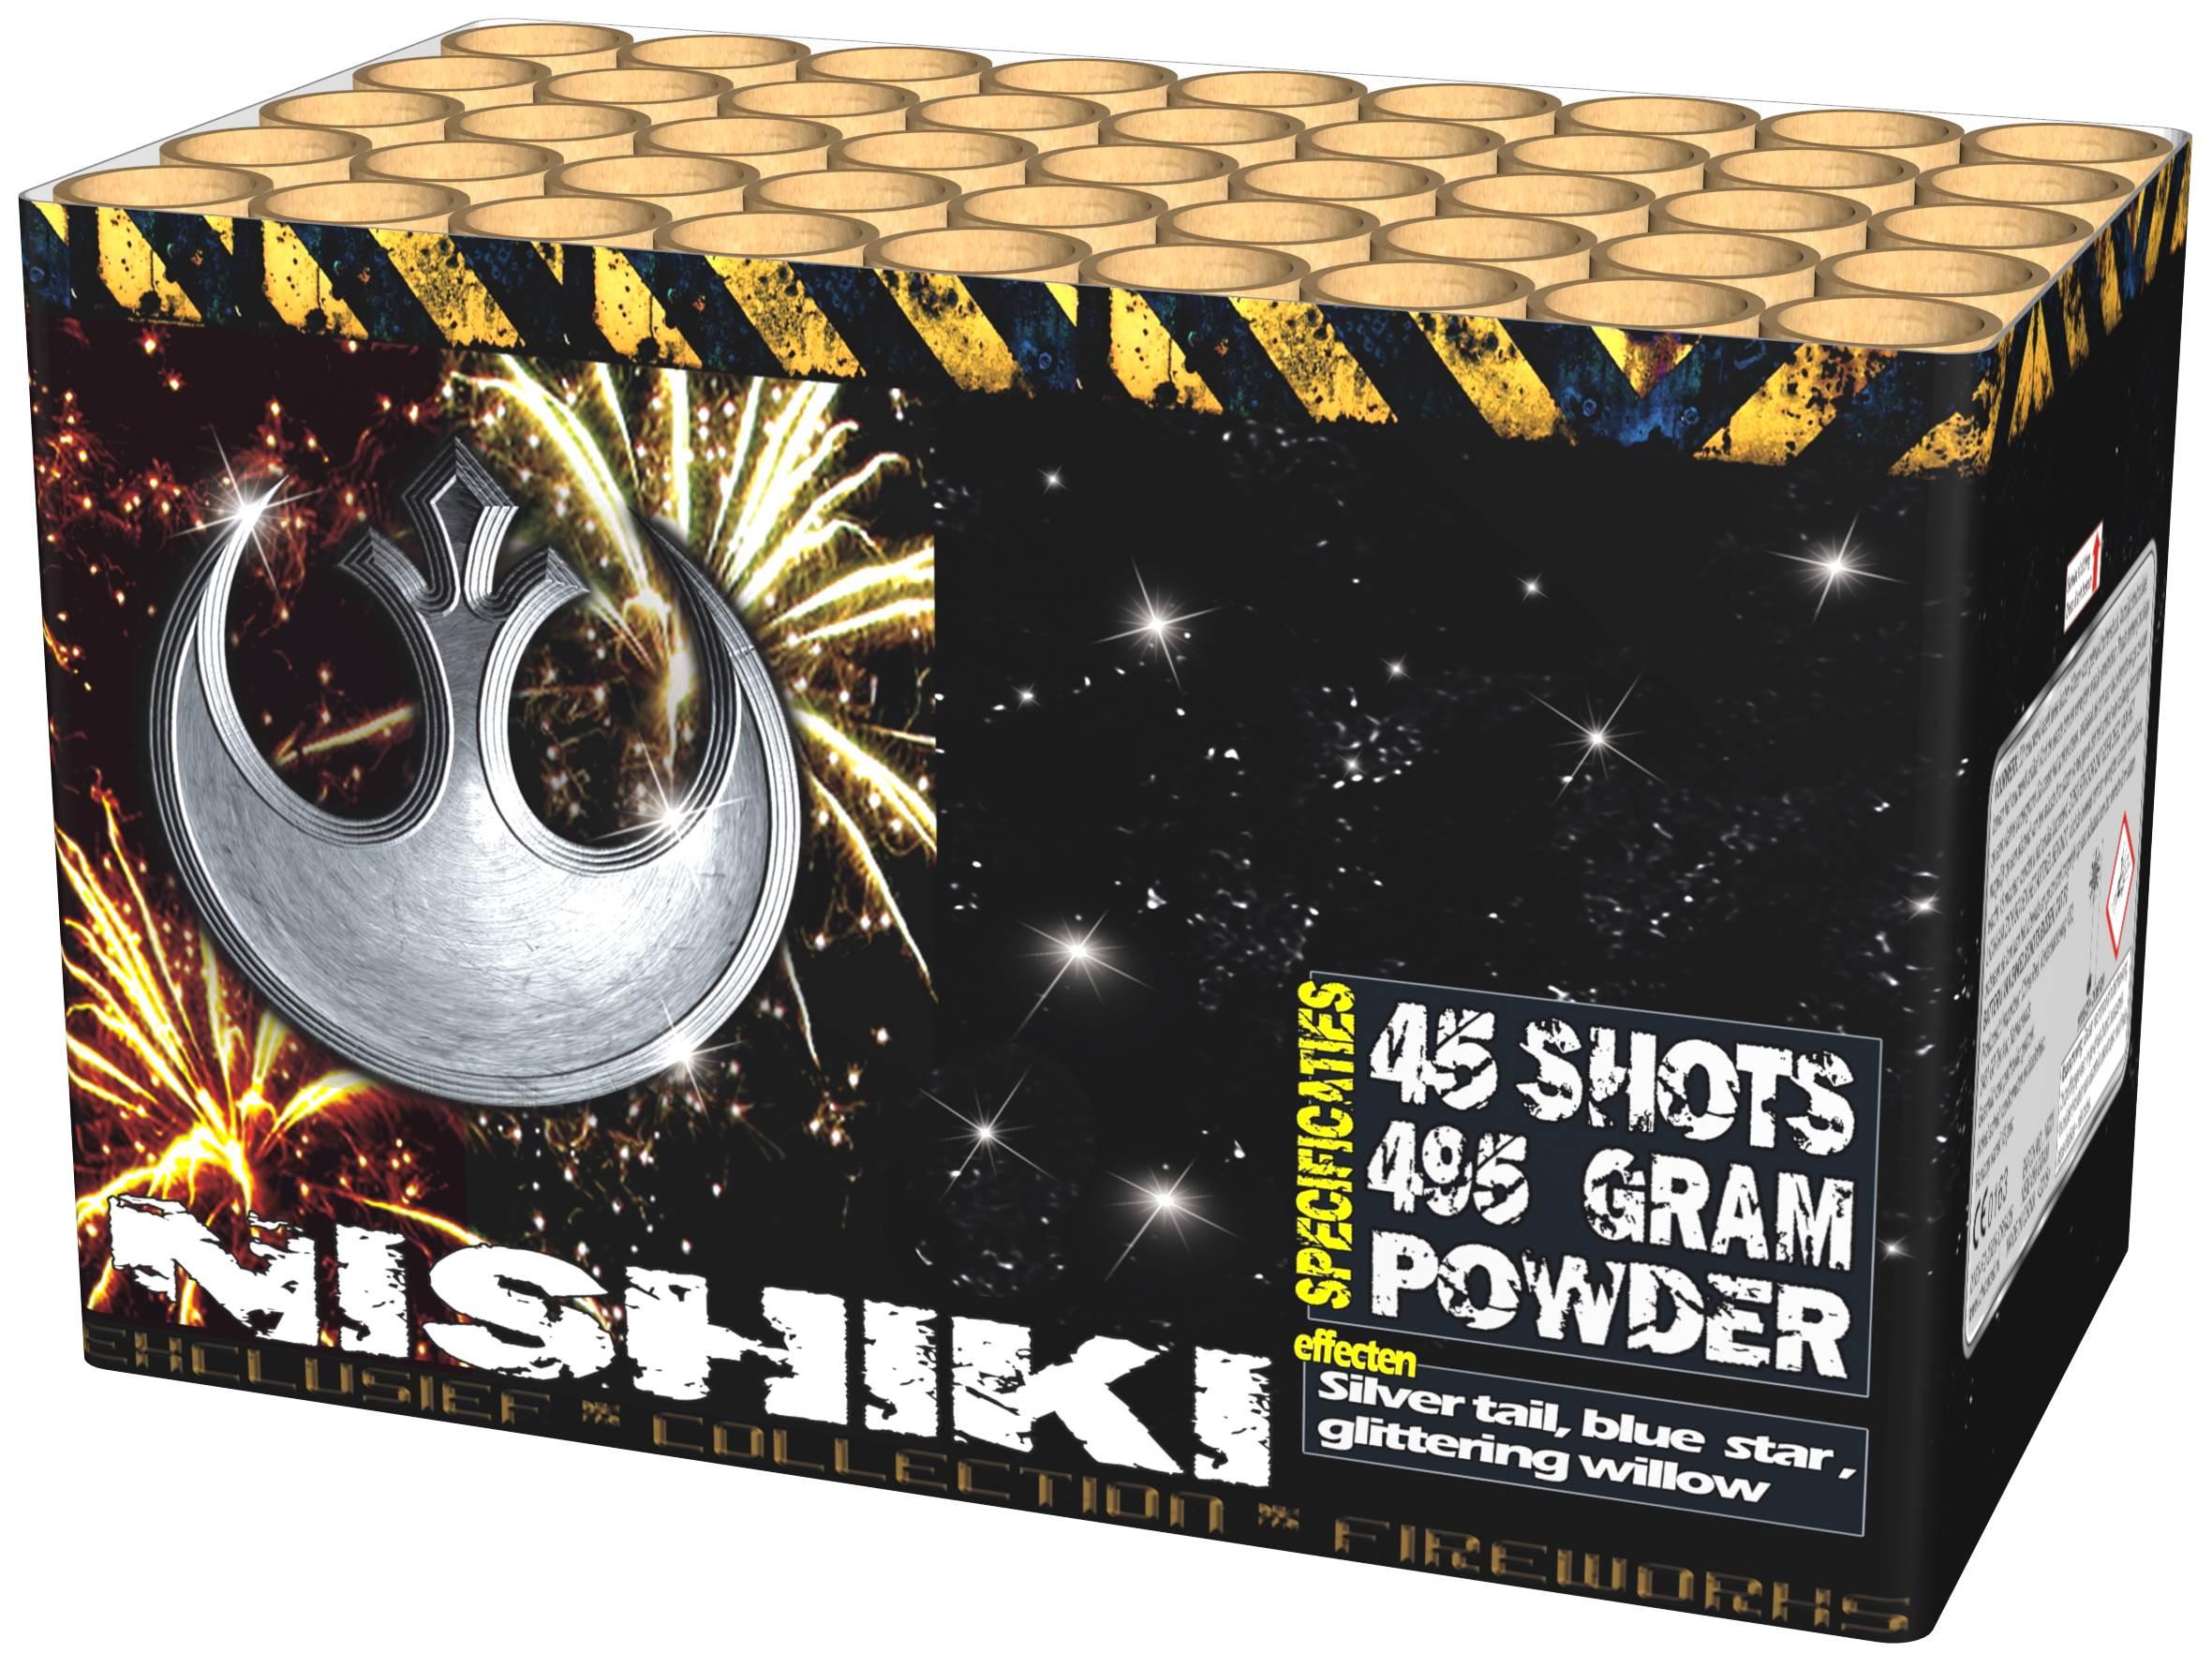 Nishiki powercake 45 shots 500 gram ky3725 china red for Intratuin lochem